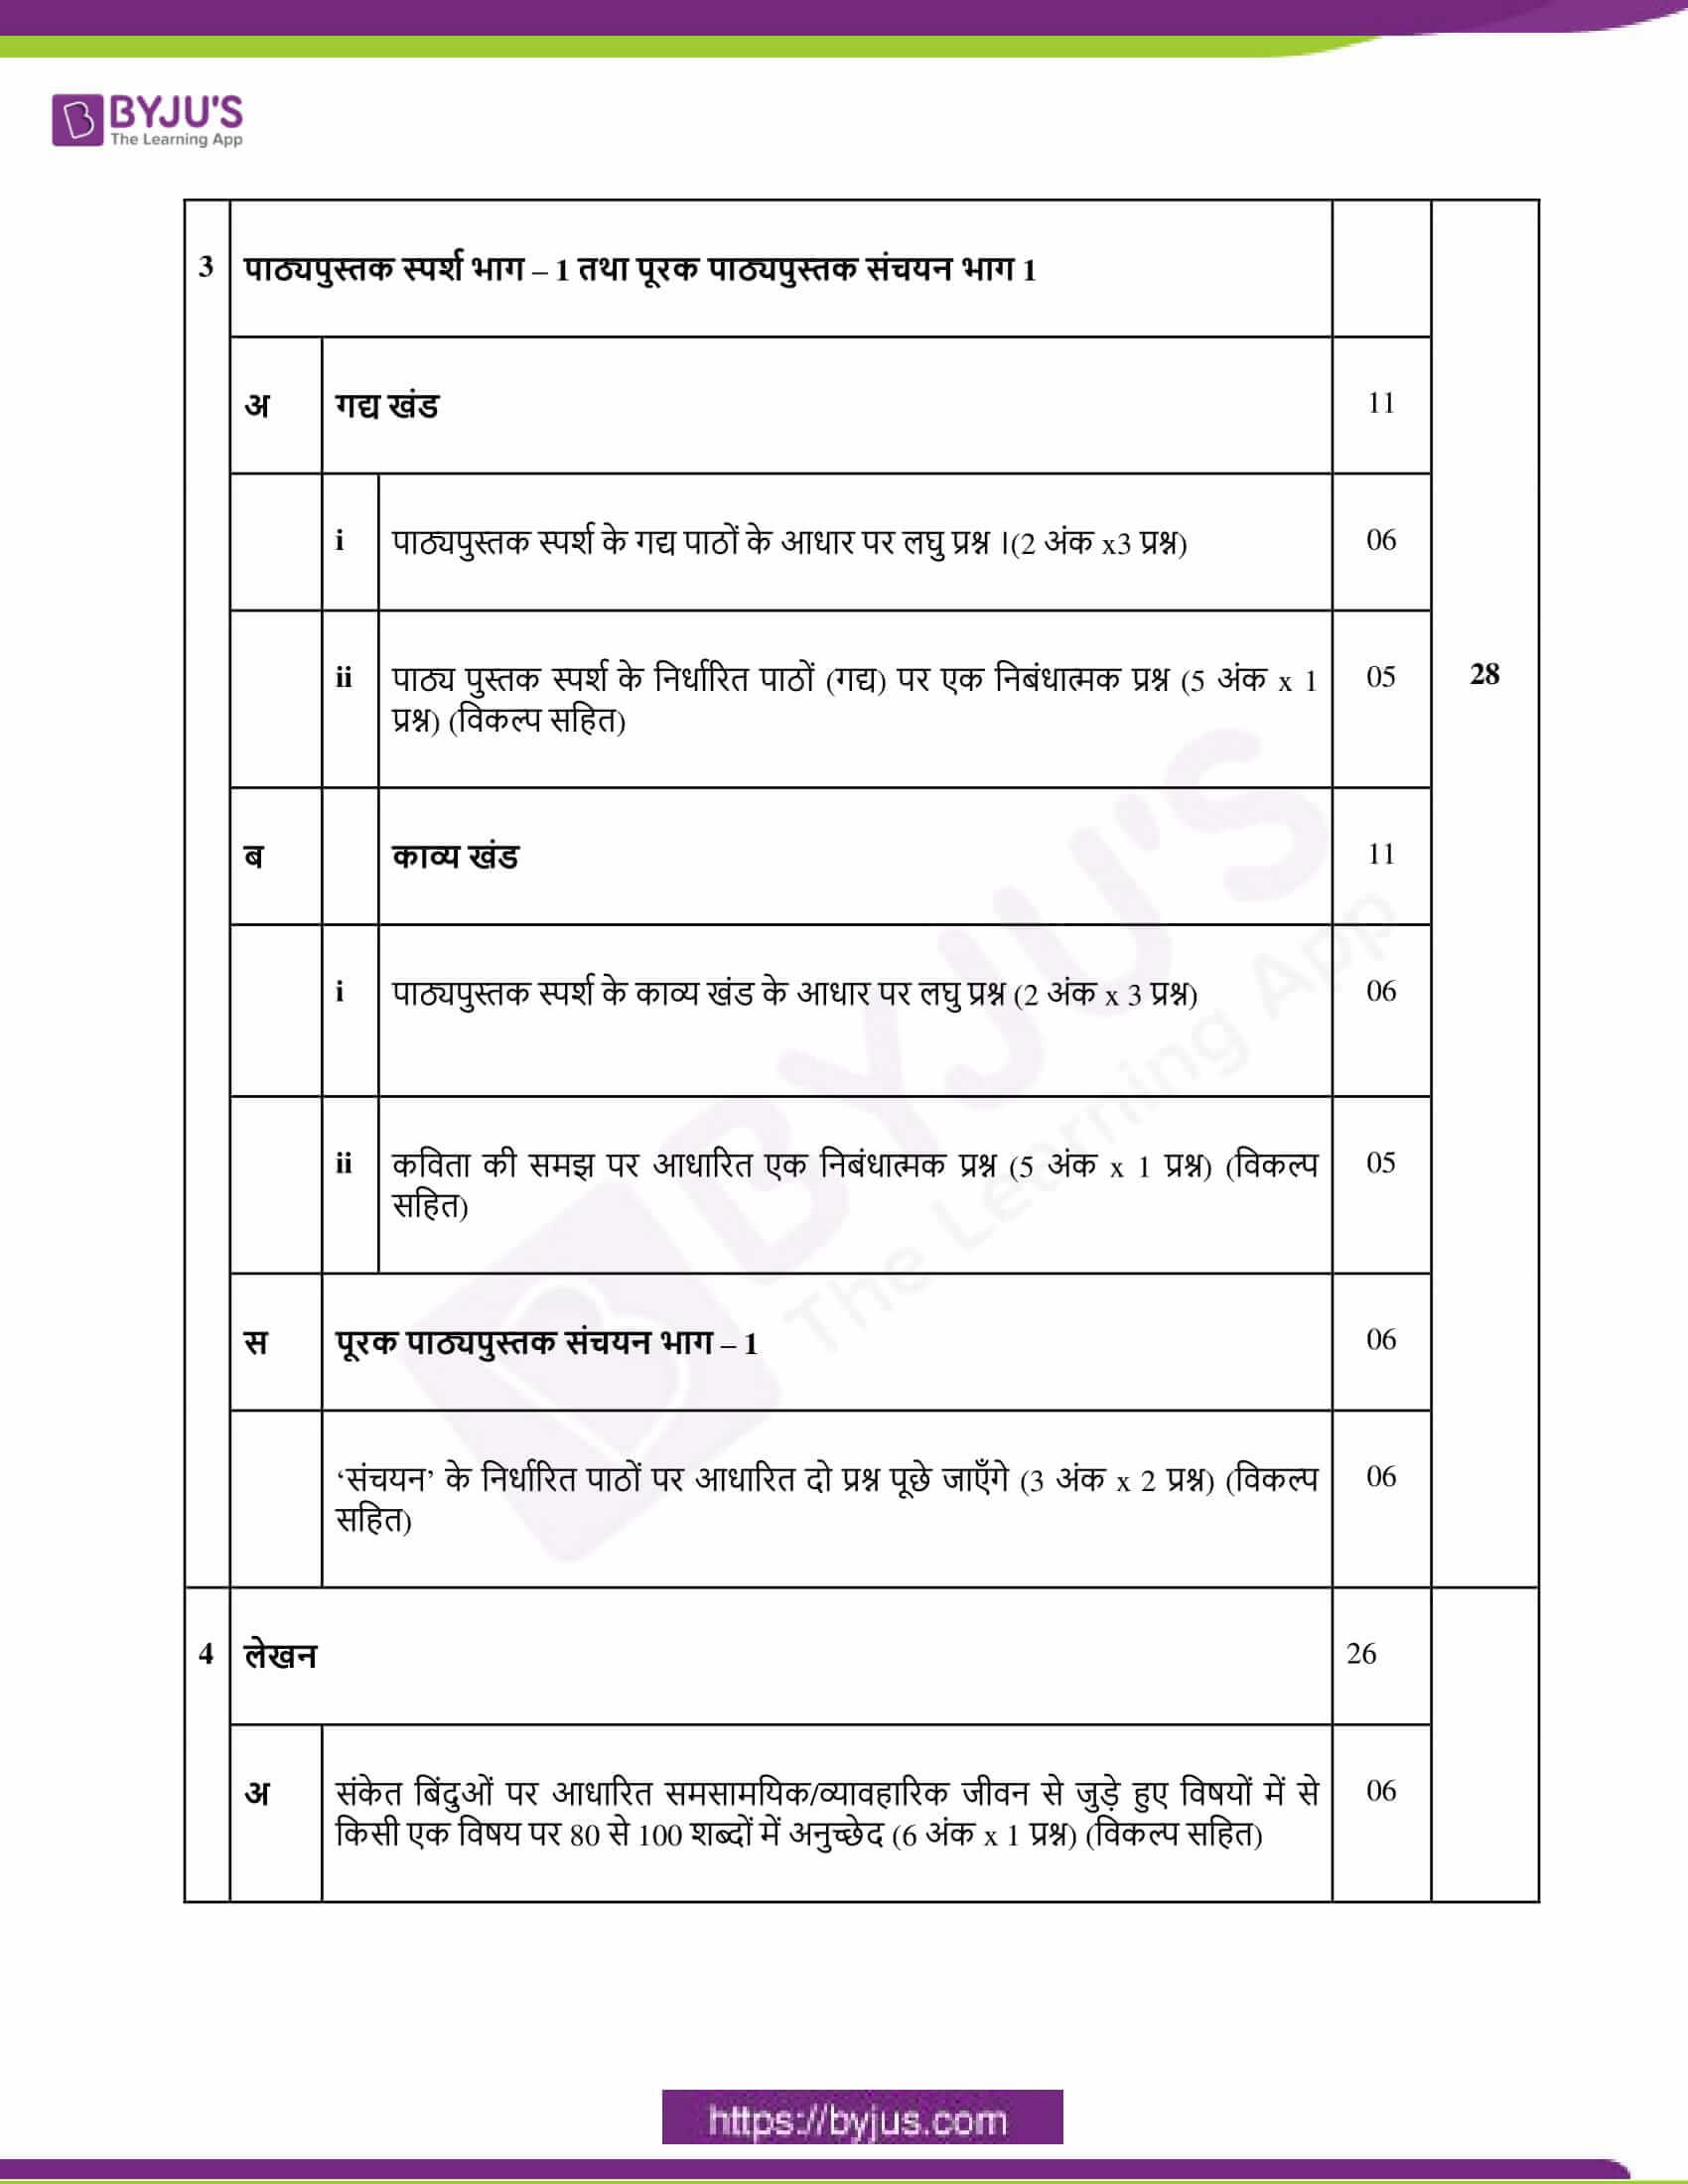 CBSE Class 9 Hindi Course B Revised Syllabus PDF 2020 21 2